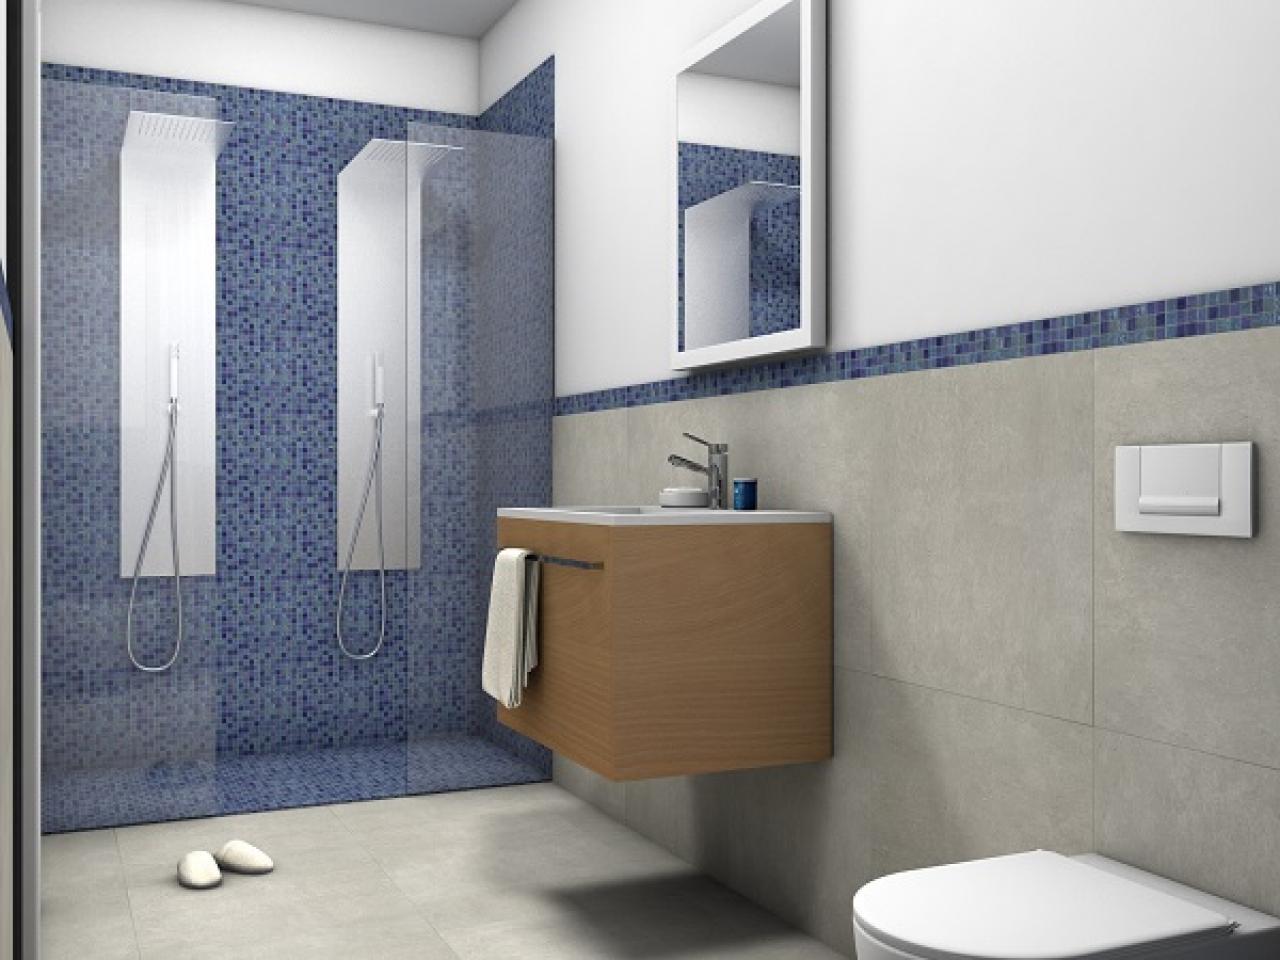 Bagno blu e bianco perfect idee per arredare un bagno blu e bianco n with bagno blu e bianco - Bagno blu e bianco ...